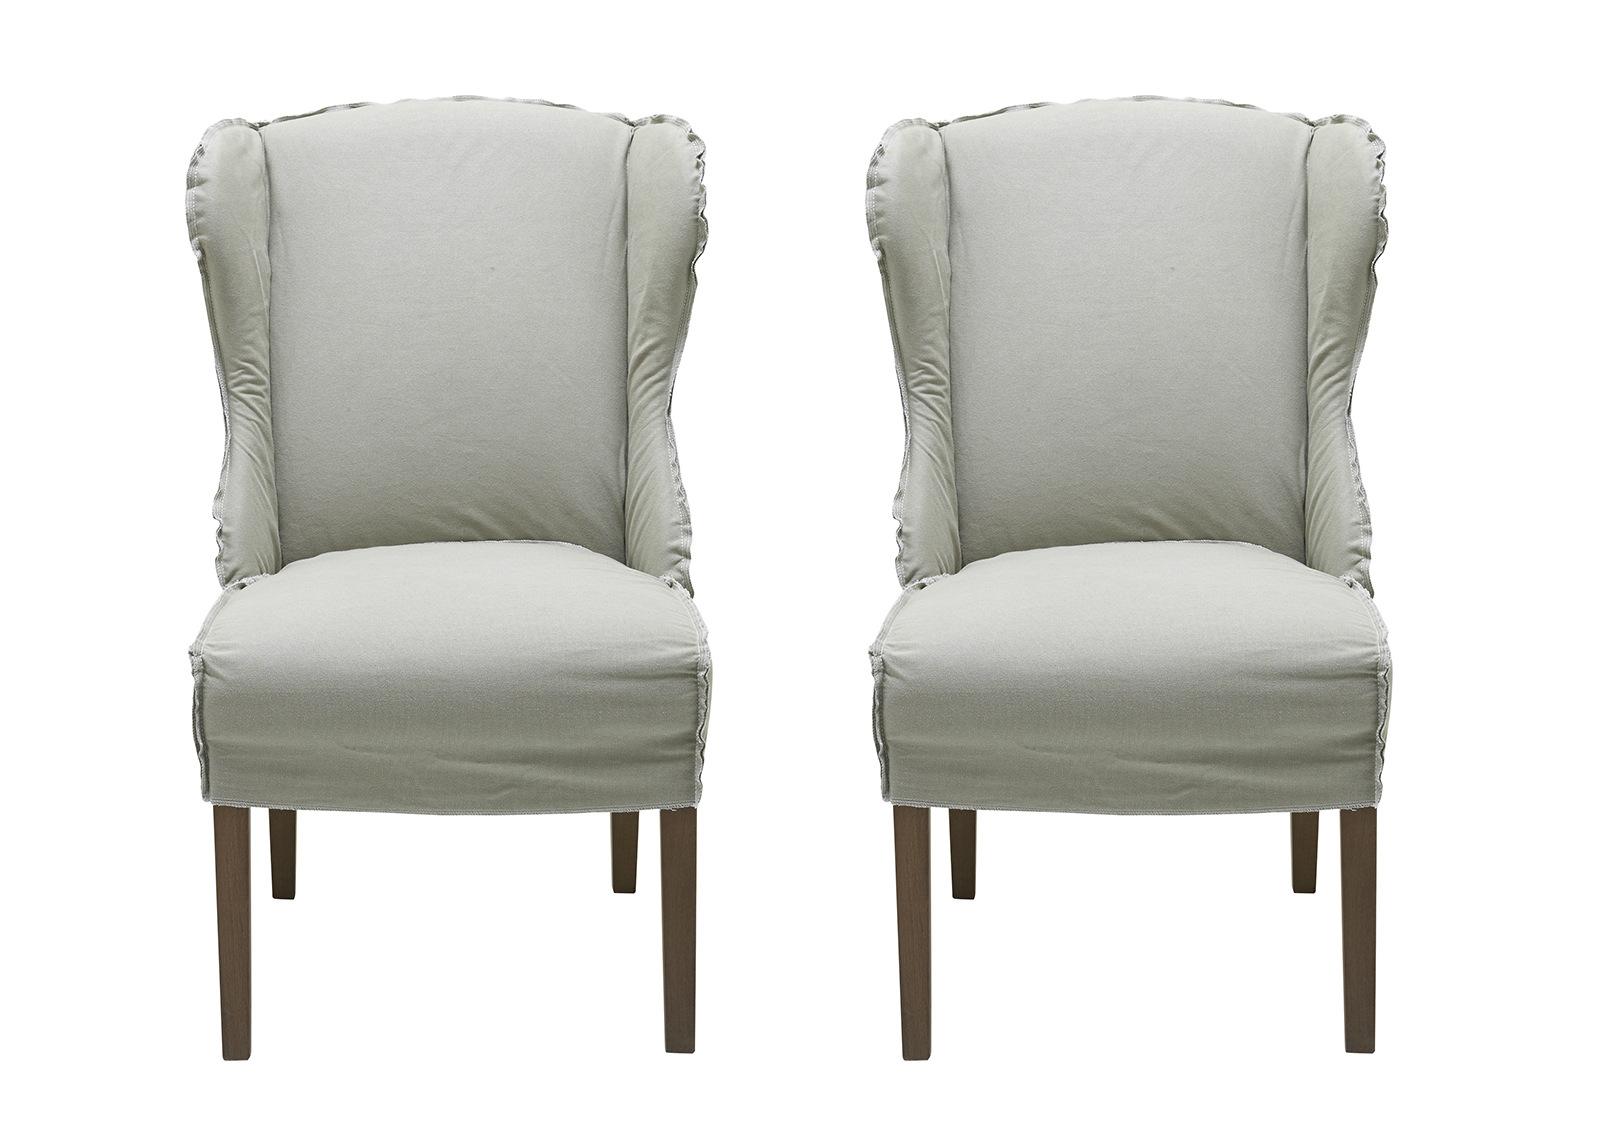 Tuolit Sit, 2 kpl